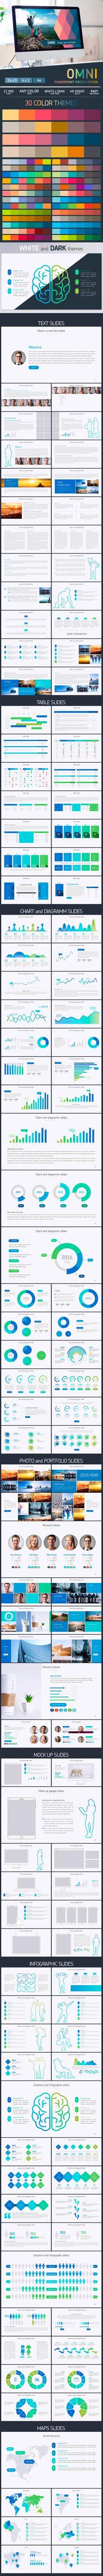 Omni - Powerpoint presentation Template #slides Download: http://graphicriver.net/item/omni-powerpoint-presentation/14459240?ref=ksioks